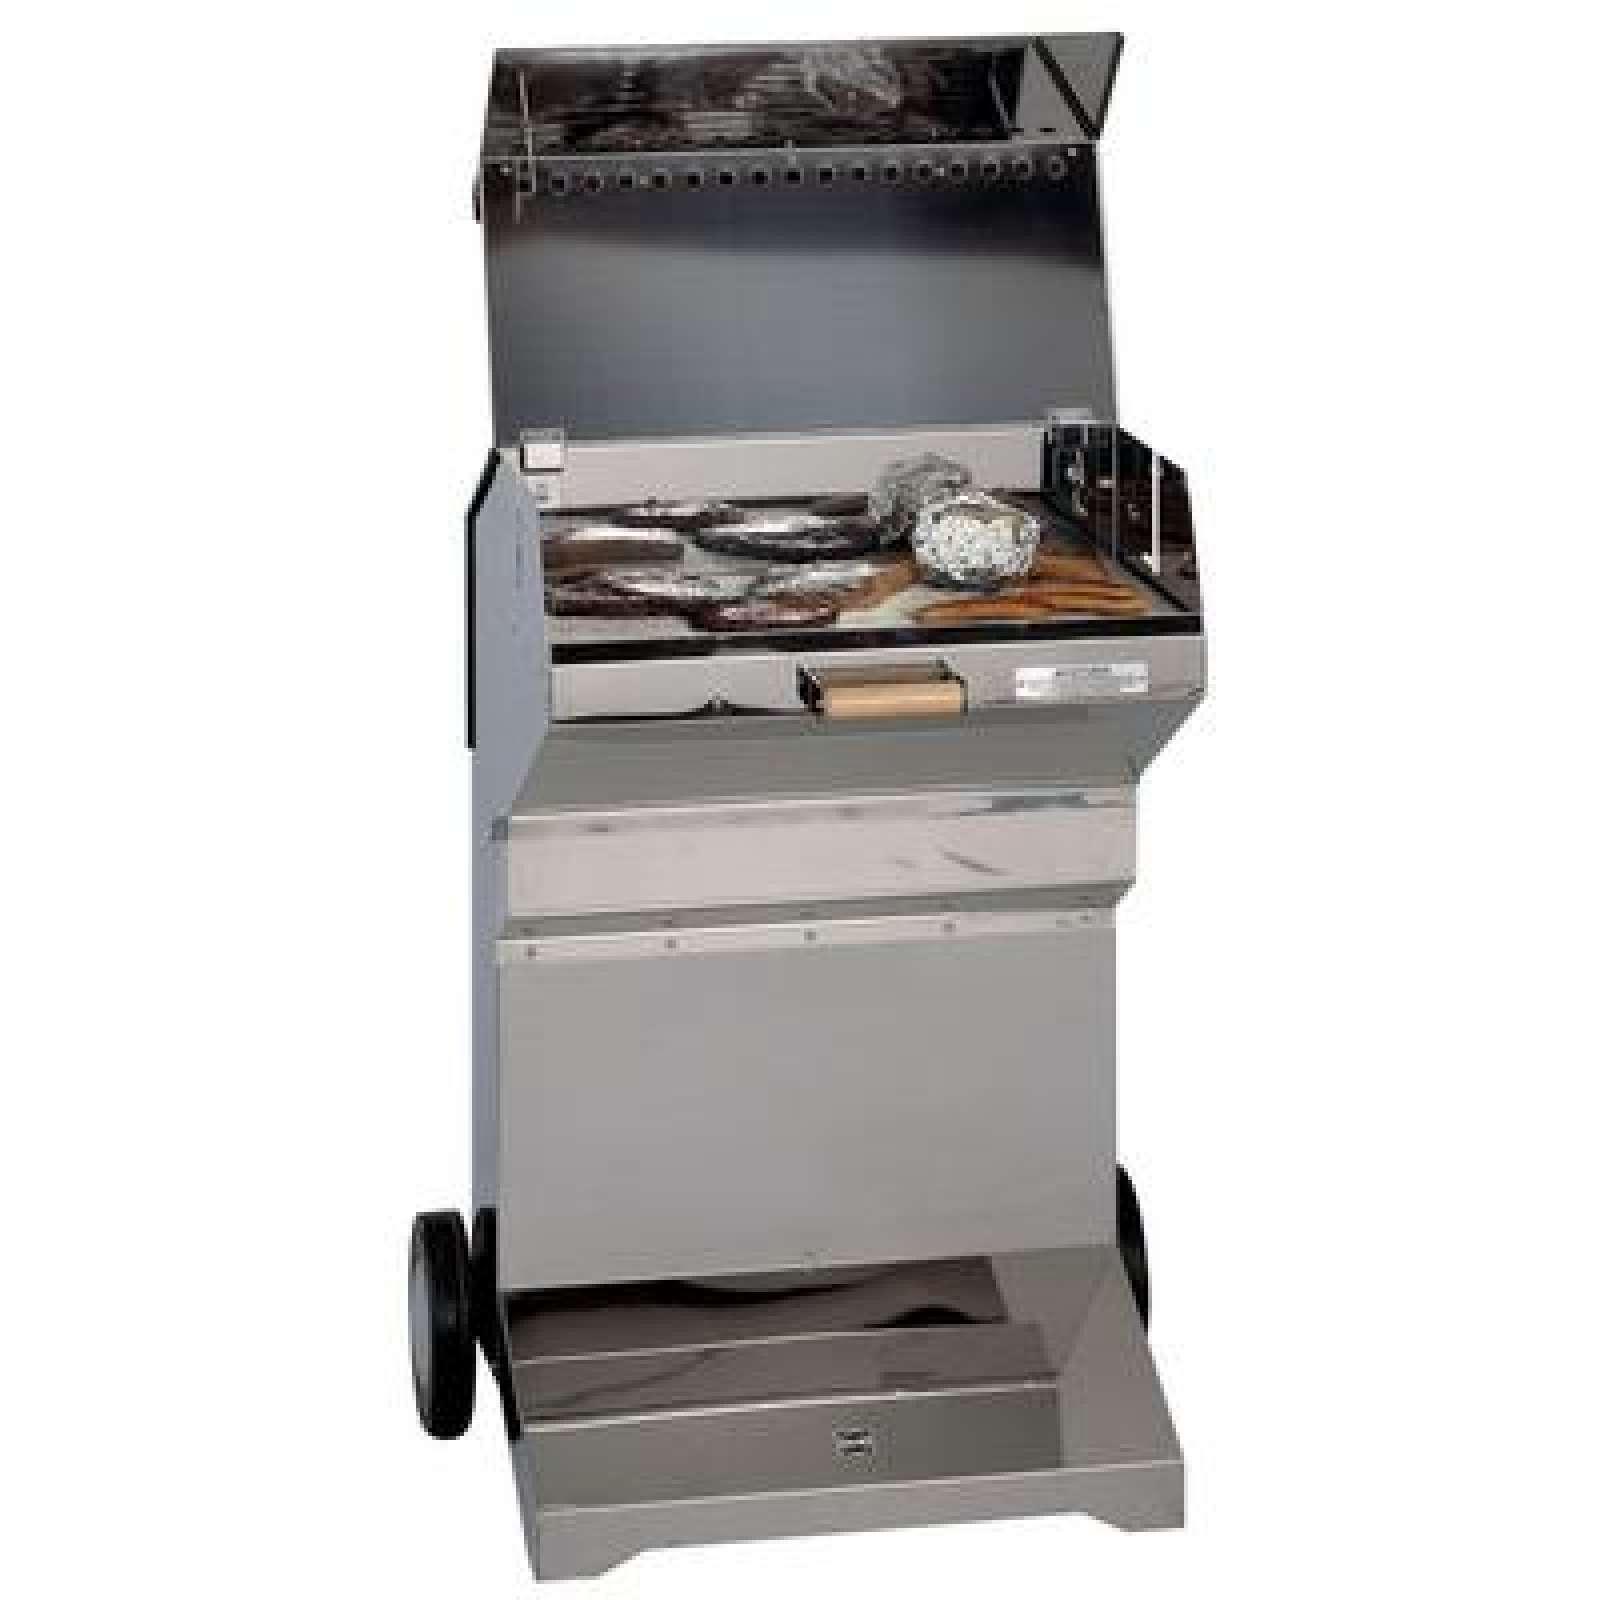 heibi edelstahl holzkohle grill 51195-072 | grillwelt24